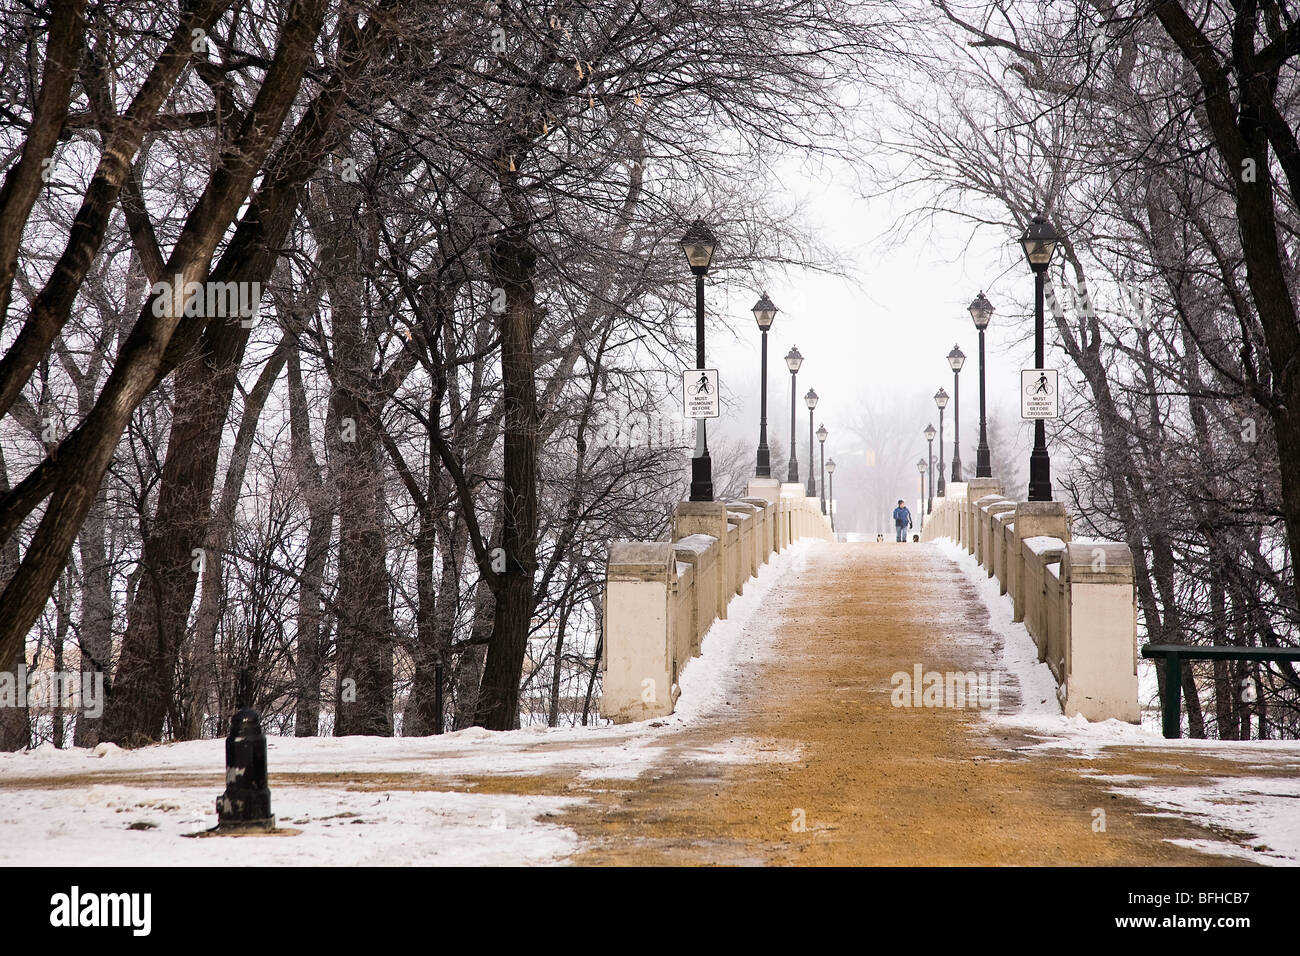 Freshly sanded Assiniboine Park Footbridge on foggy winter morning.  Winnipeg, Manitoba, Canada. - Stock Image